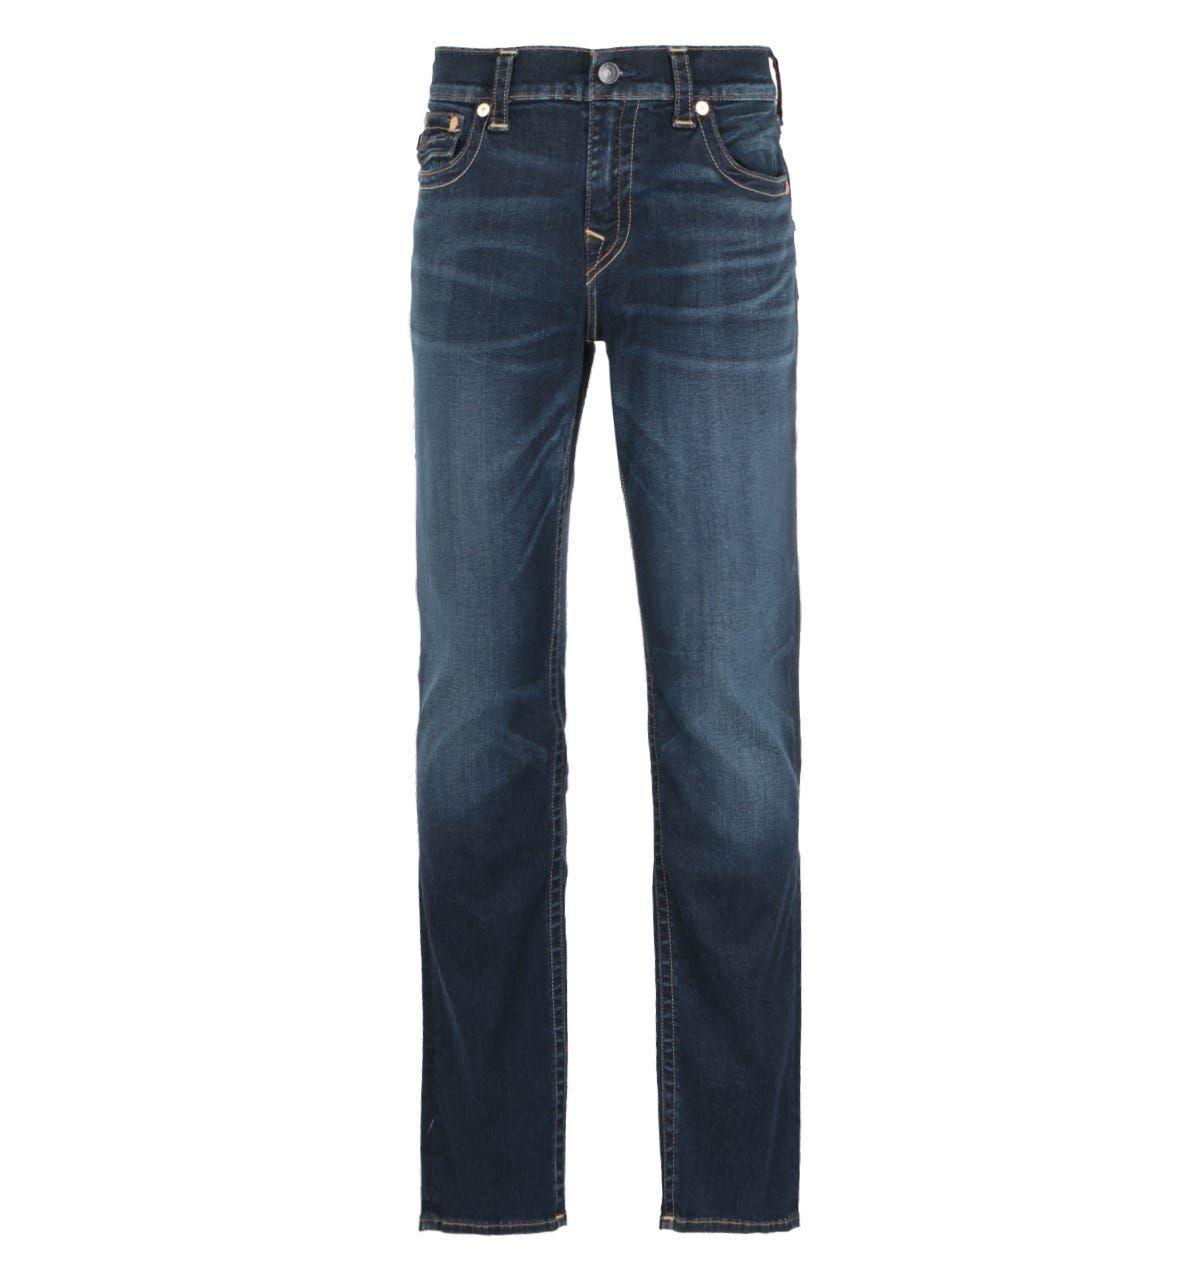 True Religion Ricky Straight Flap Dark Fusion Blue Jeans